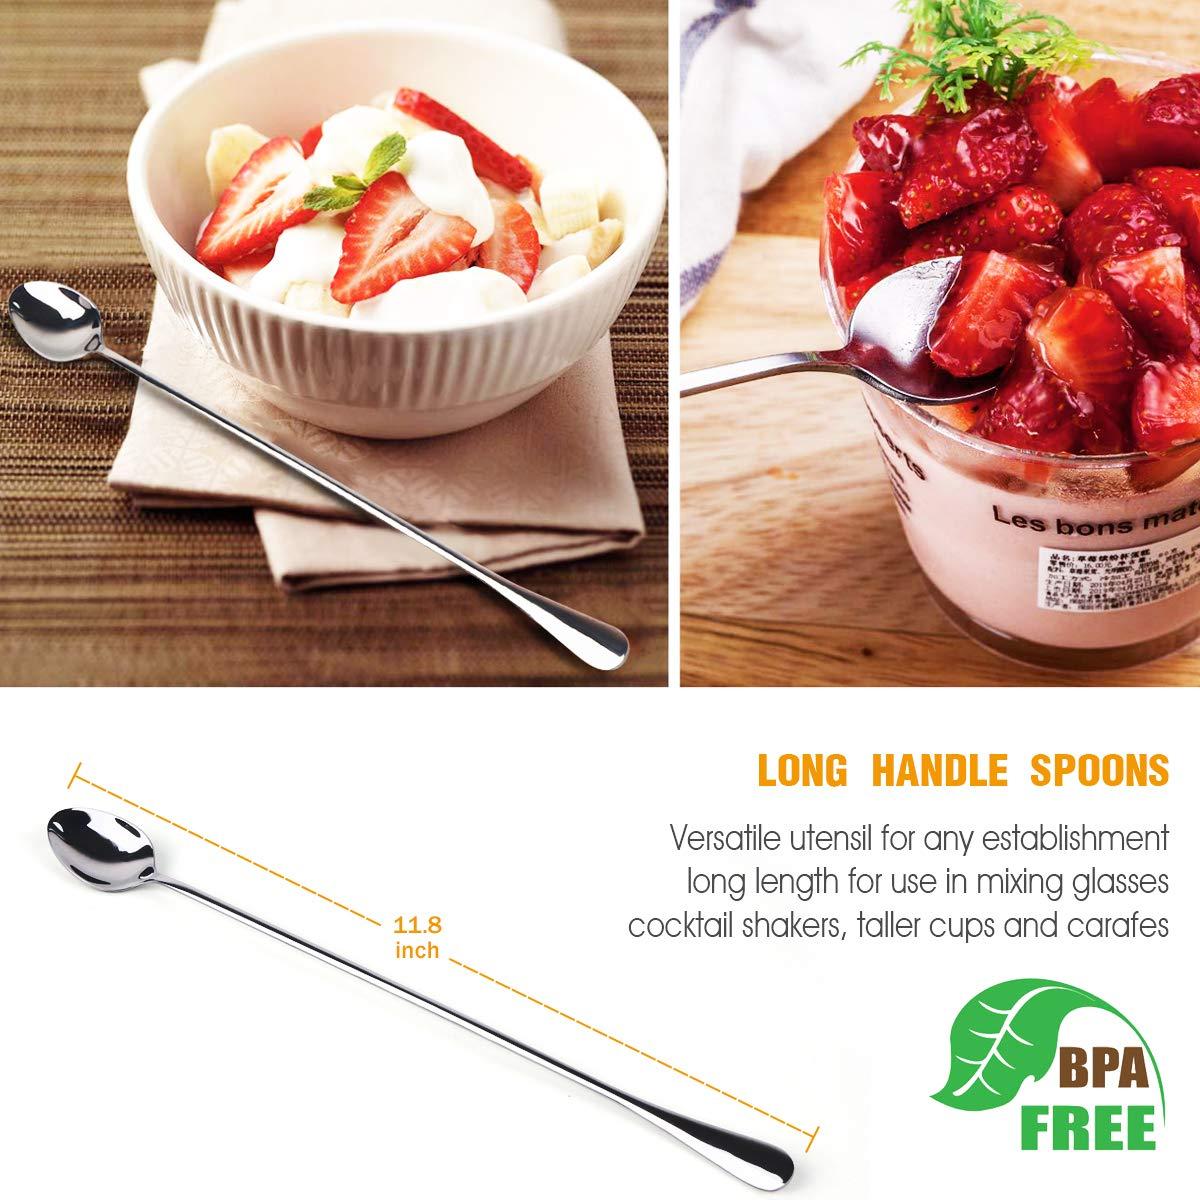 Silverware Flatware Cutlery SetPortable Utensils LPOLER 32 Pieces Stainless Steel Utensils Service